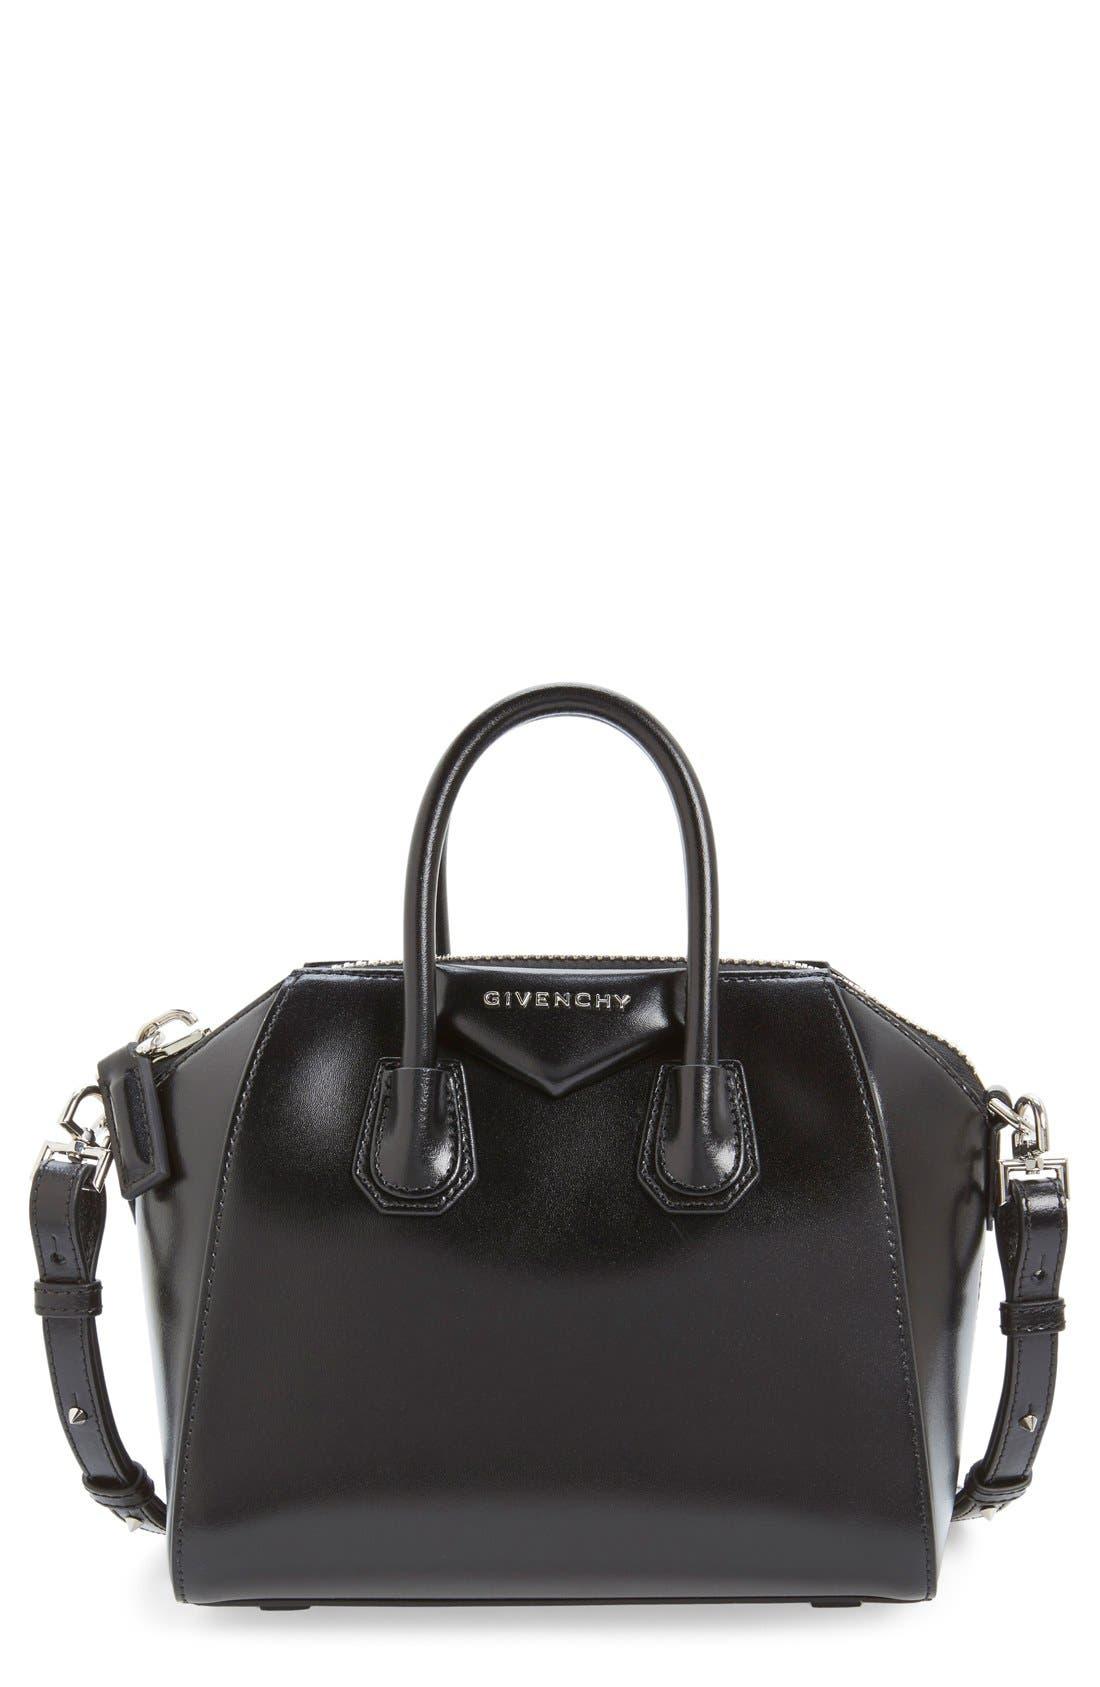 GIVENCHY Mini Antigona Box Leather Satchel